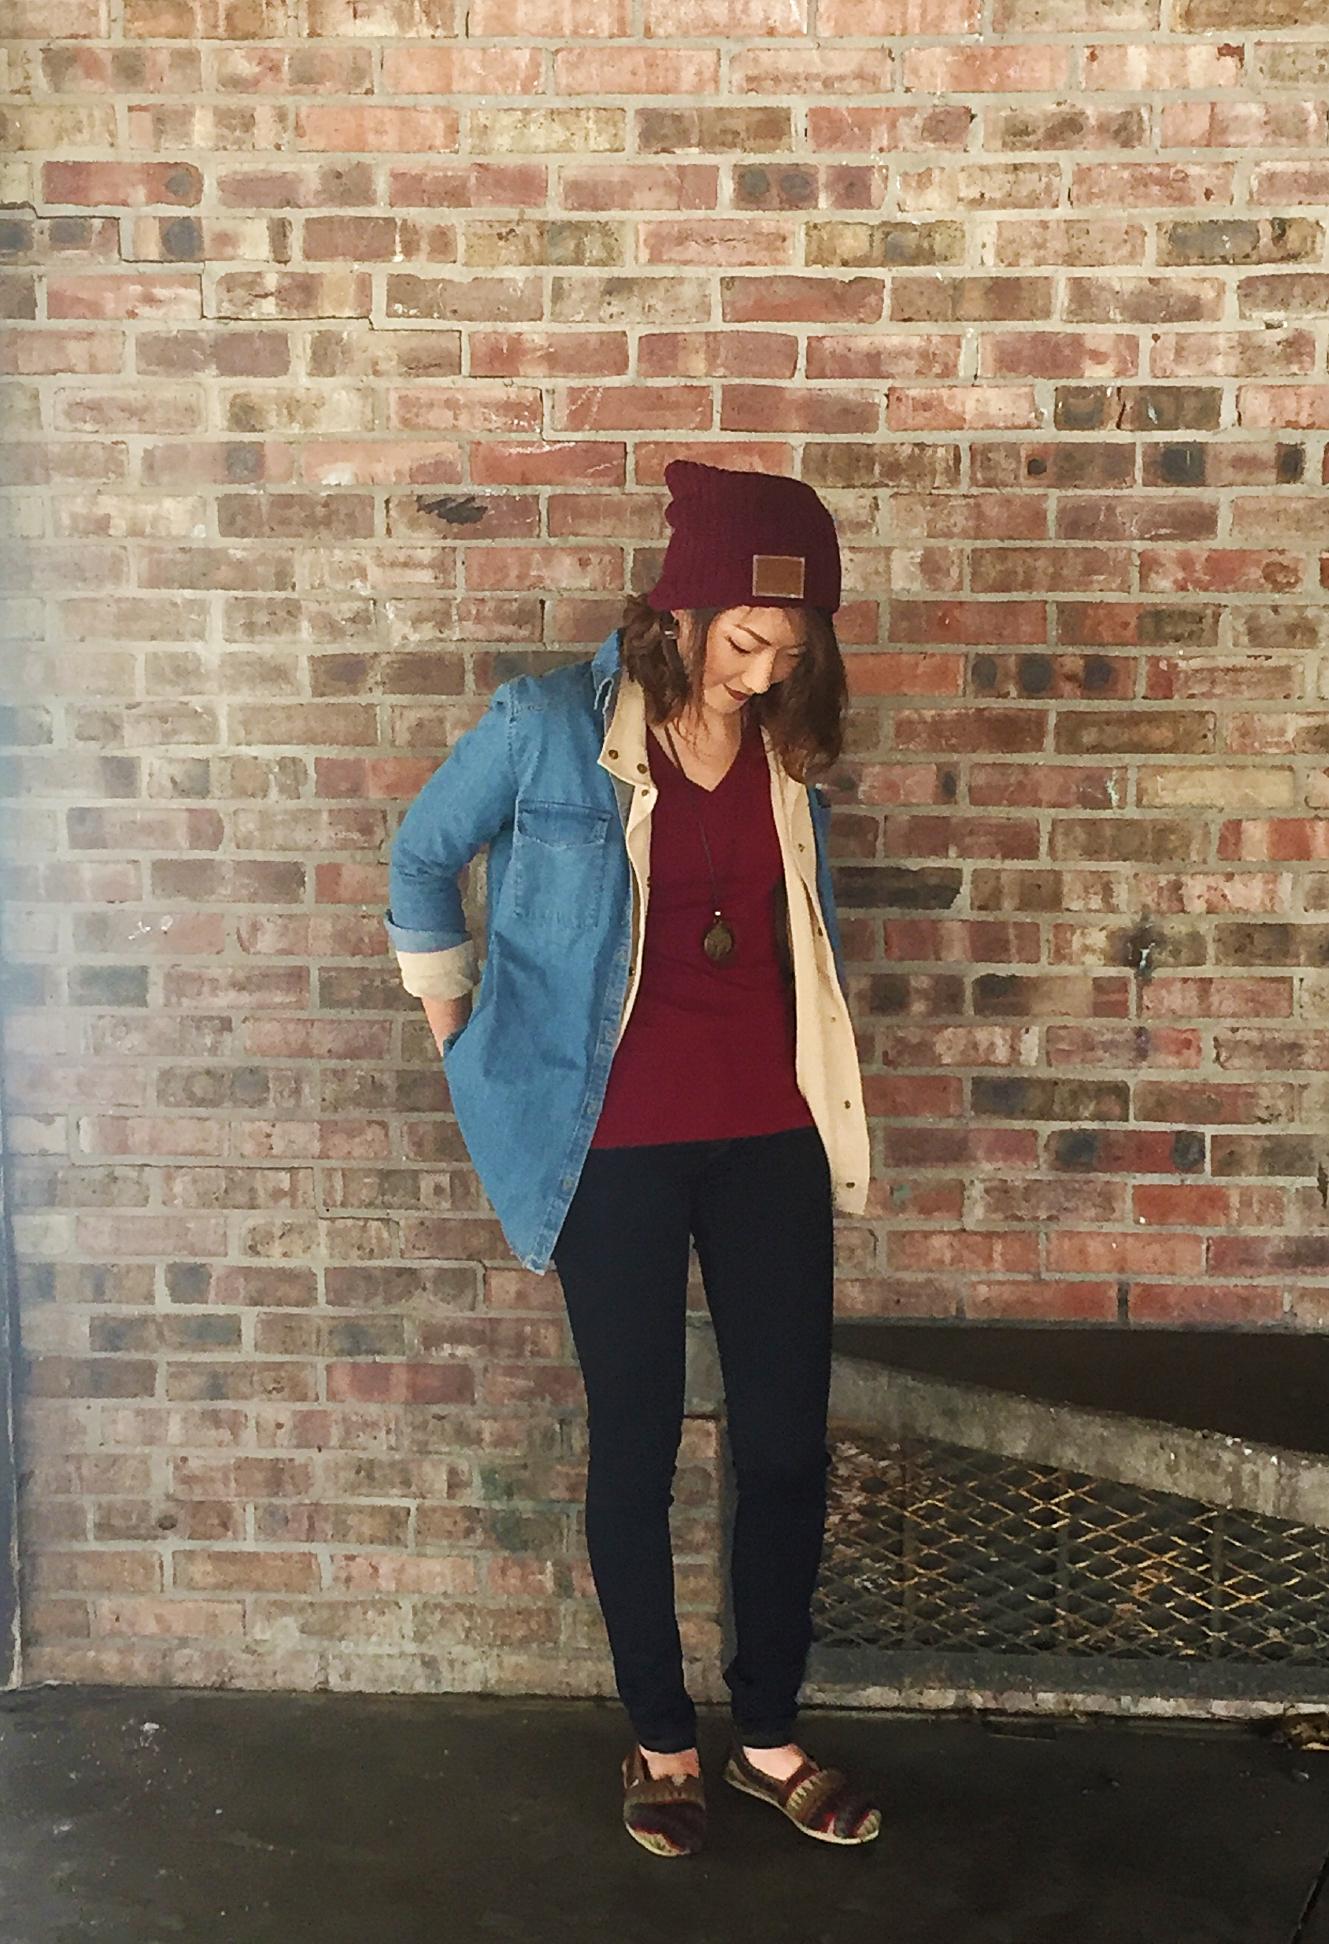 Jean Jacket: H&M / Beige Jacket: Zara / Beanie:  Love Your Melon  / Necklace:  StylebyKenlee  / Shoes: Toms / Lips:  Colour Pop in Frick N' Frack